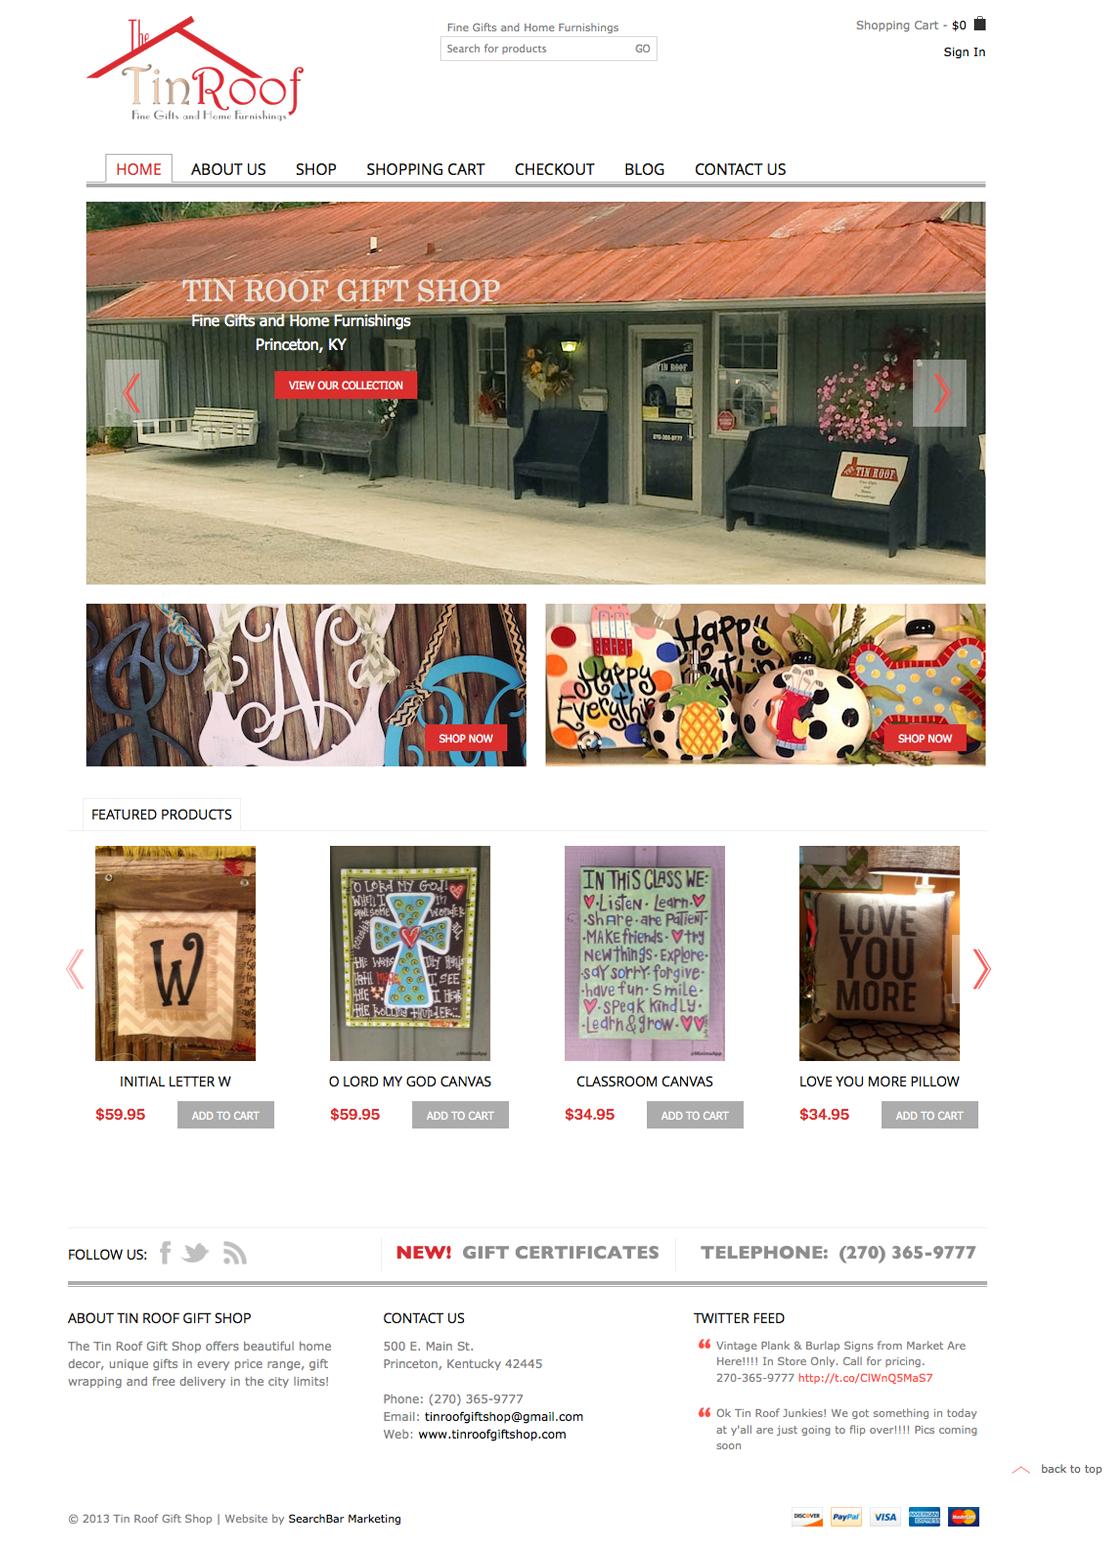 Tin Roof Gift Shop Website Design   SearchBar Marketing